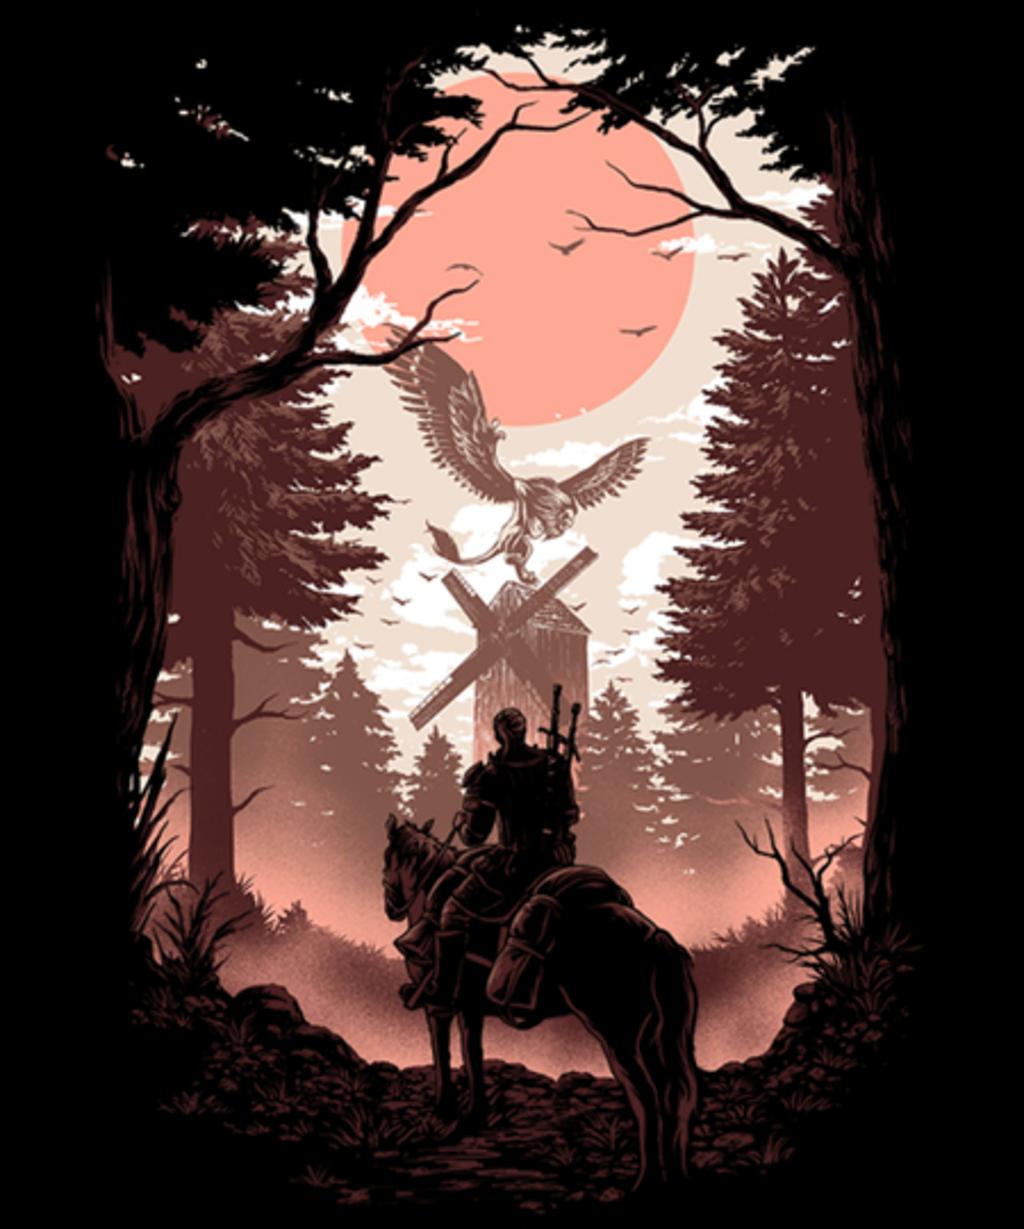 Qwertee: The Wild Hunt